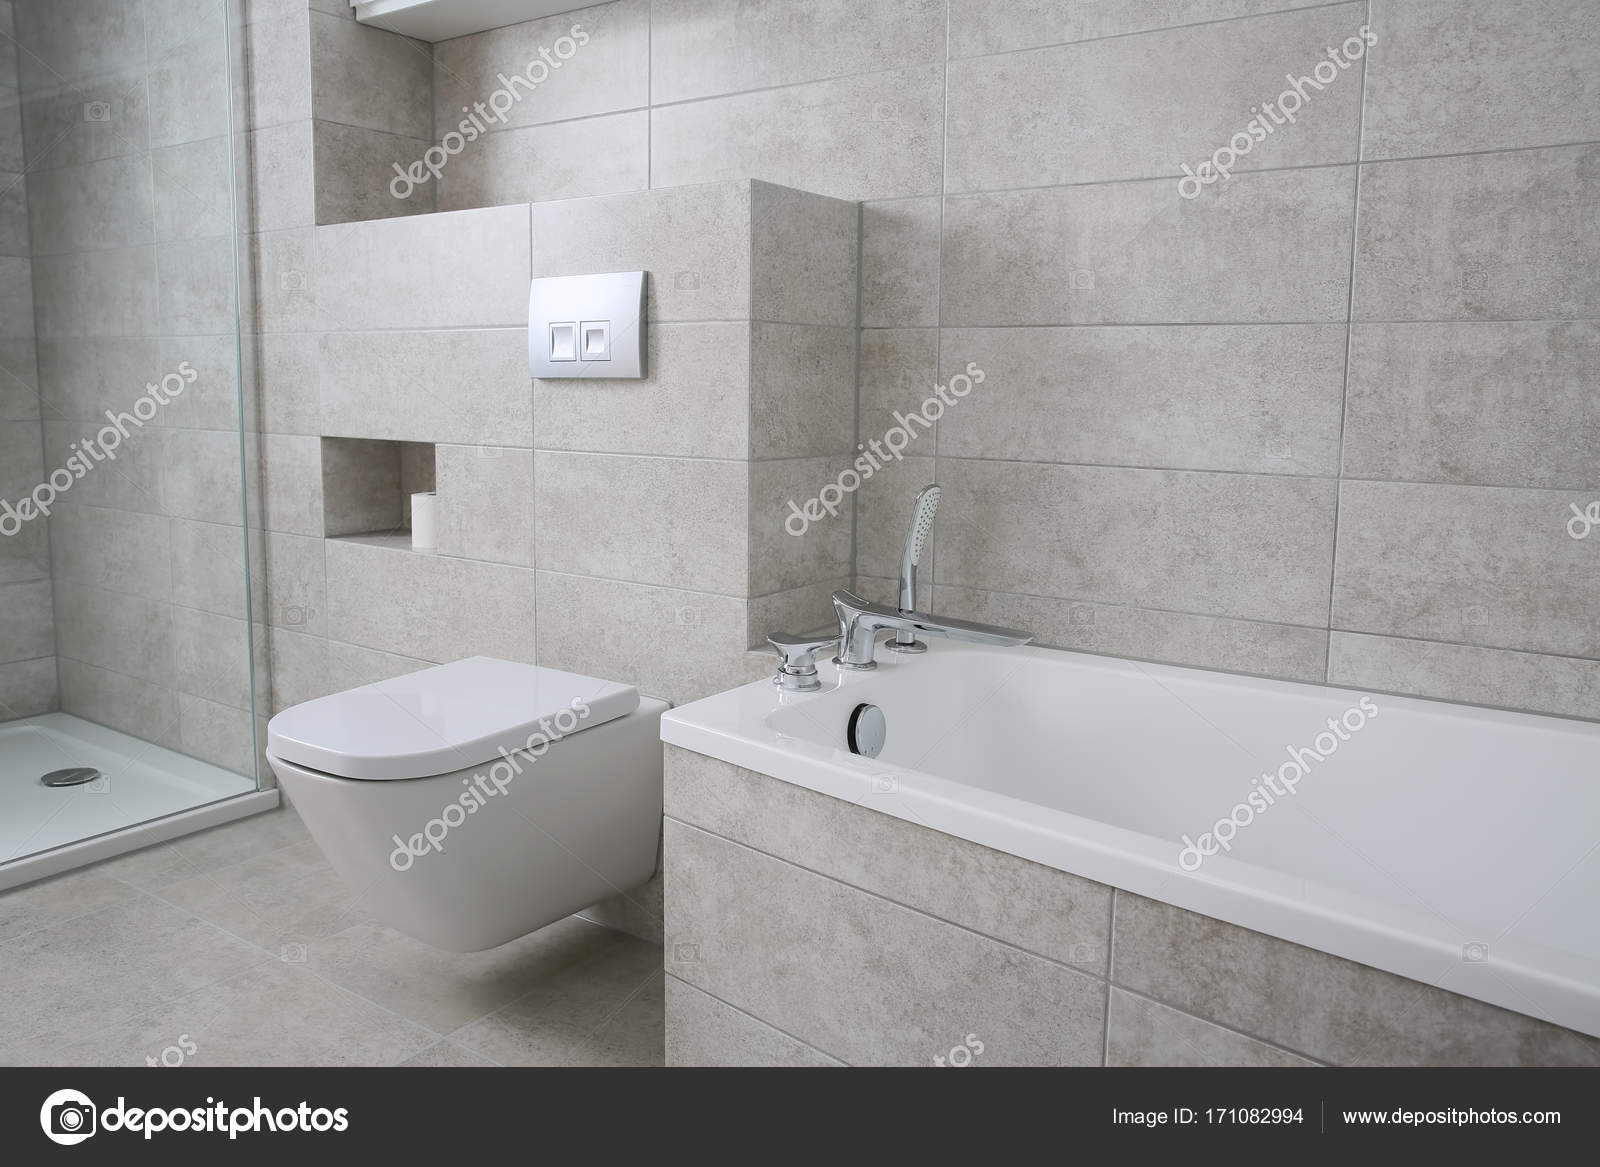 Bagni Con Piastrelle Bianchi : Bagno arredato con mobili bianchi u foto stock krzysztofwinnik